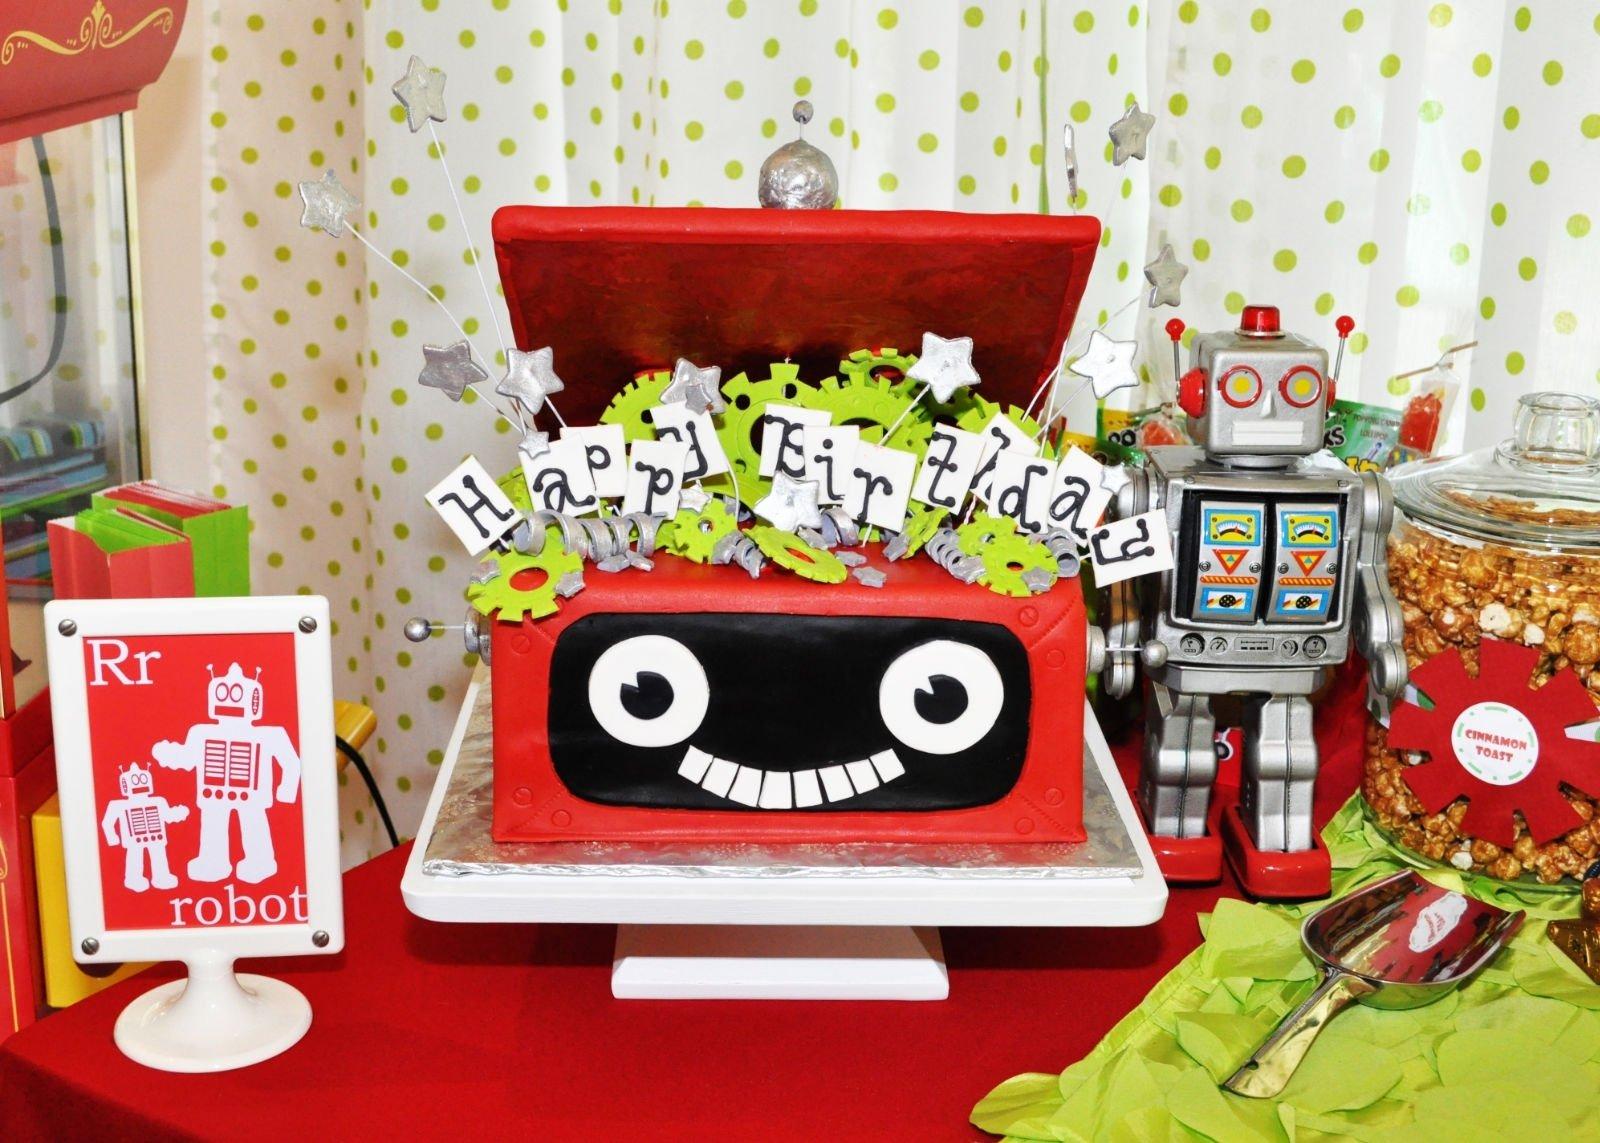 10 Unique Birthday Party Ideas For Boys Age 7 50 awesome boys birthday party ideas i heart naptime 51 2020